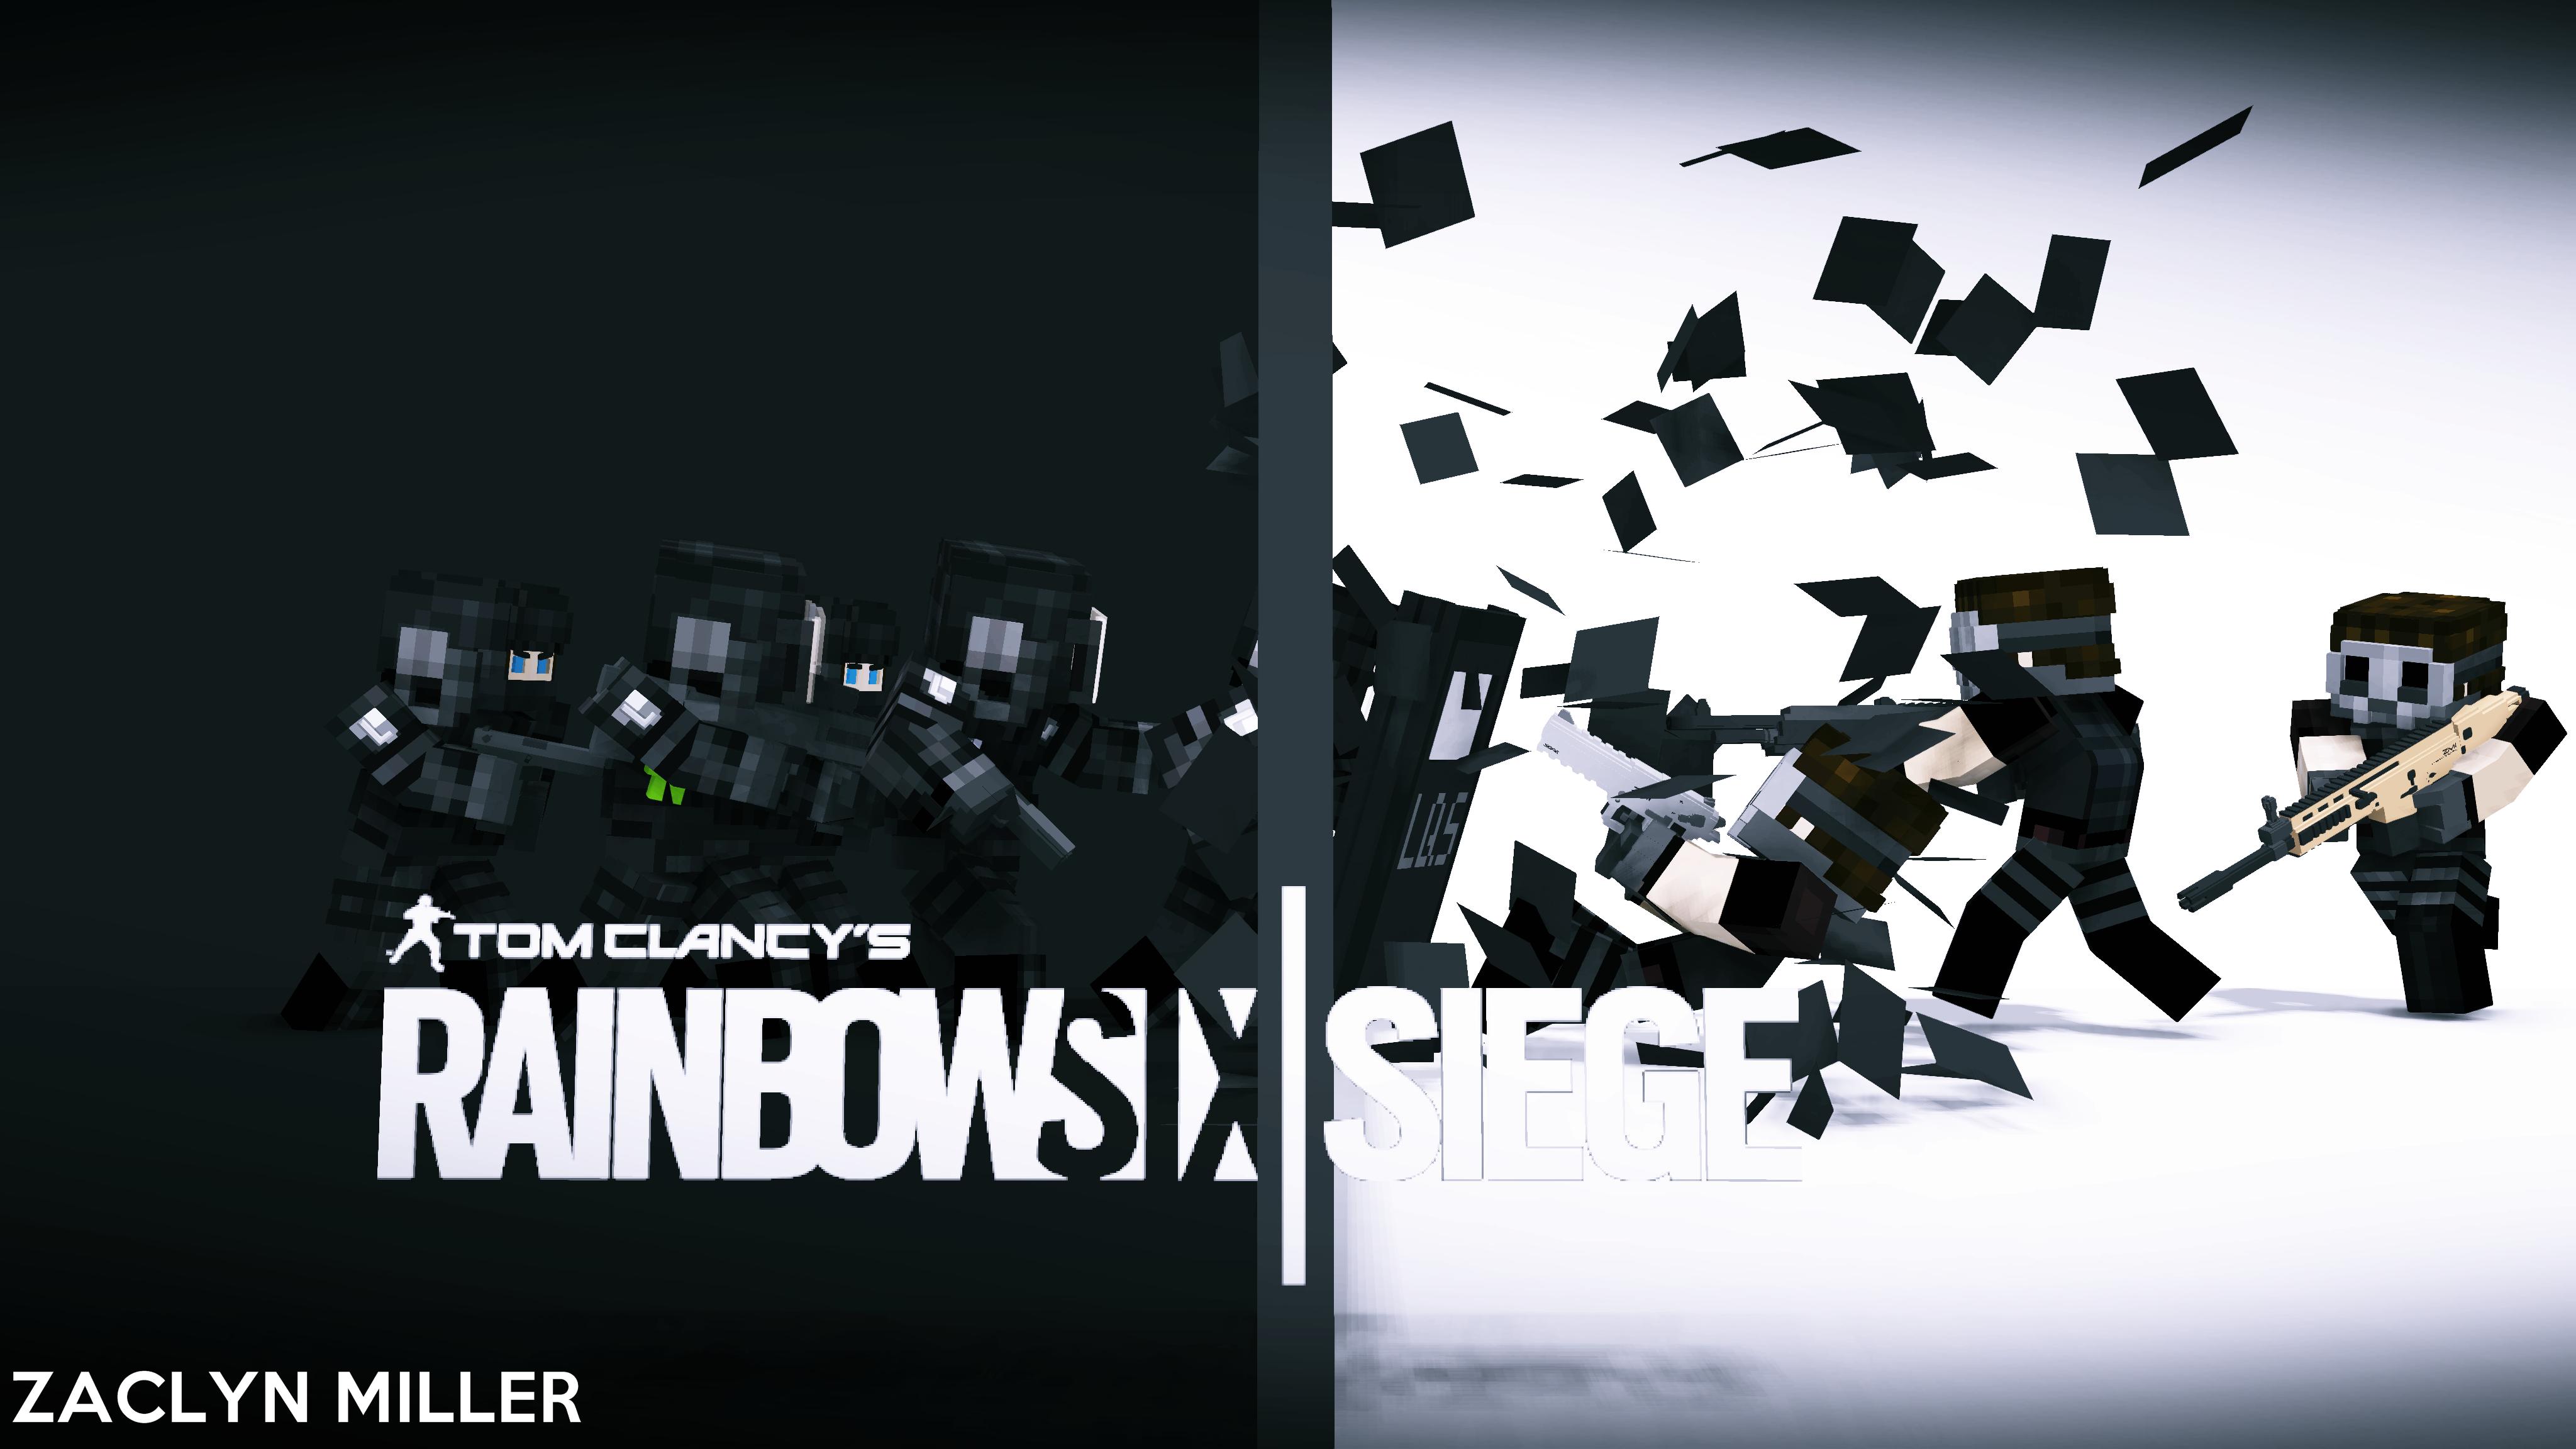 2016 Rainbow Six Siege Wallpa